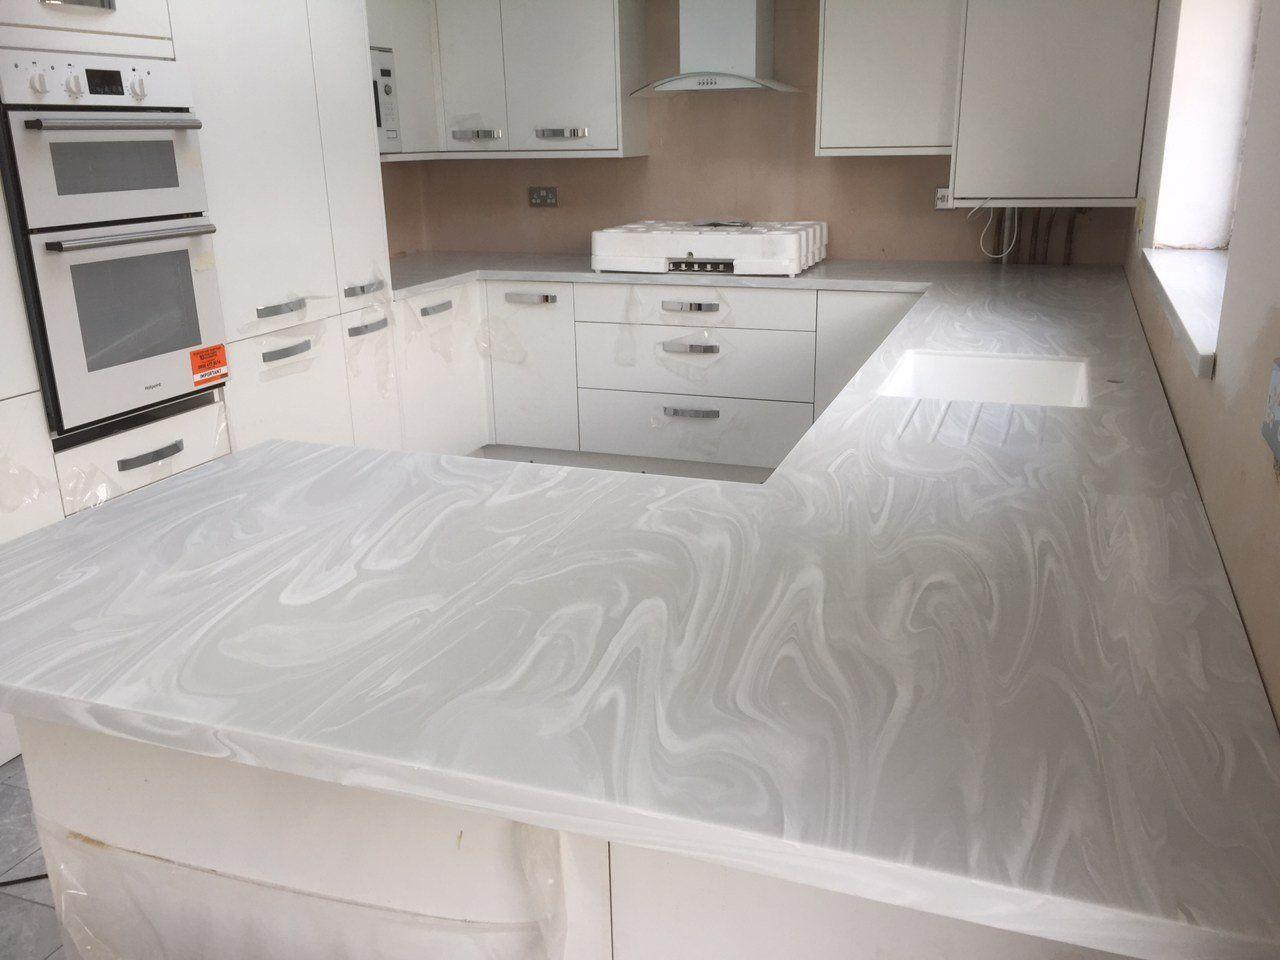 Domestic Worktops Glasgow By Worktop Solutions Ltd Tel 0141 237